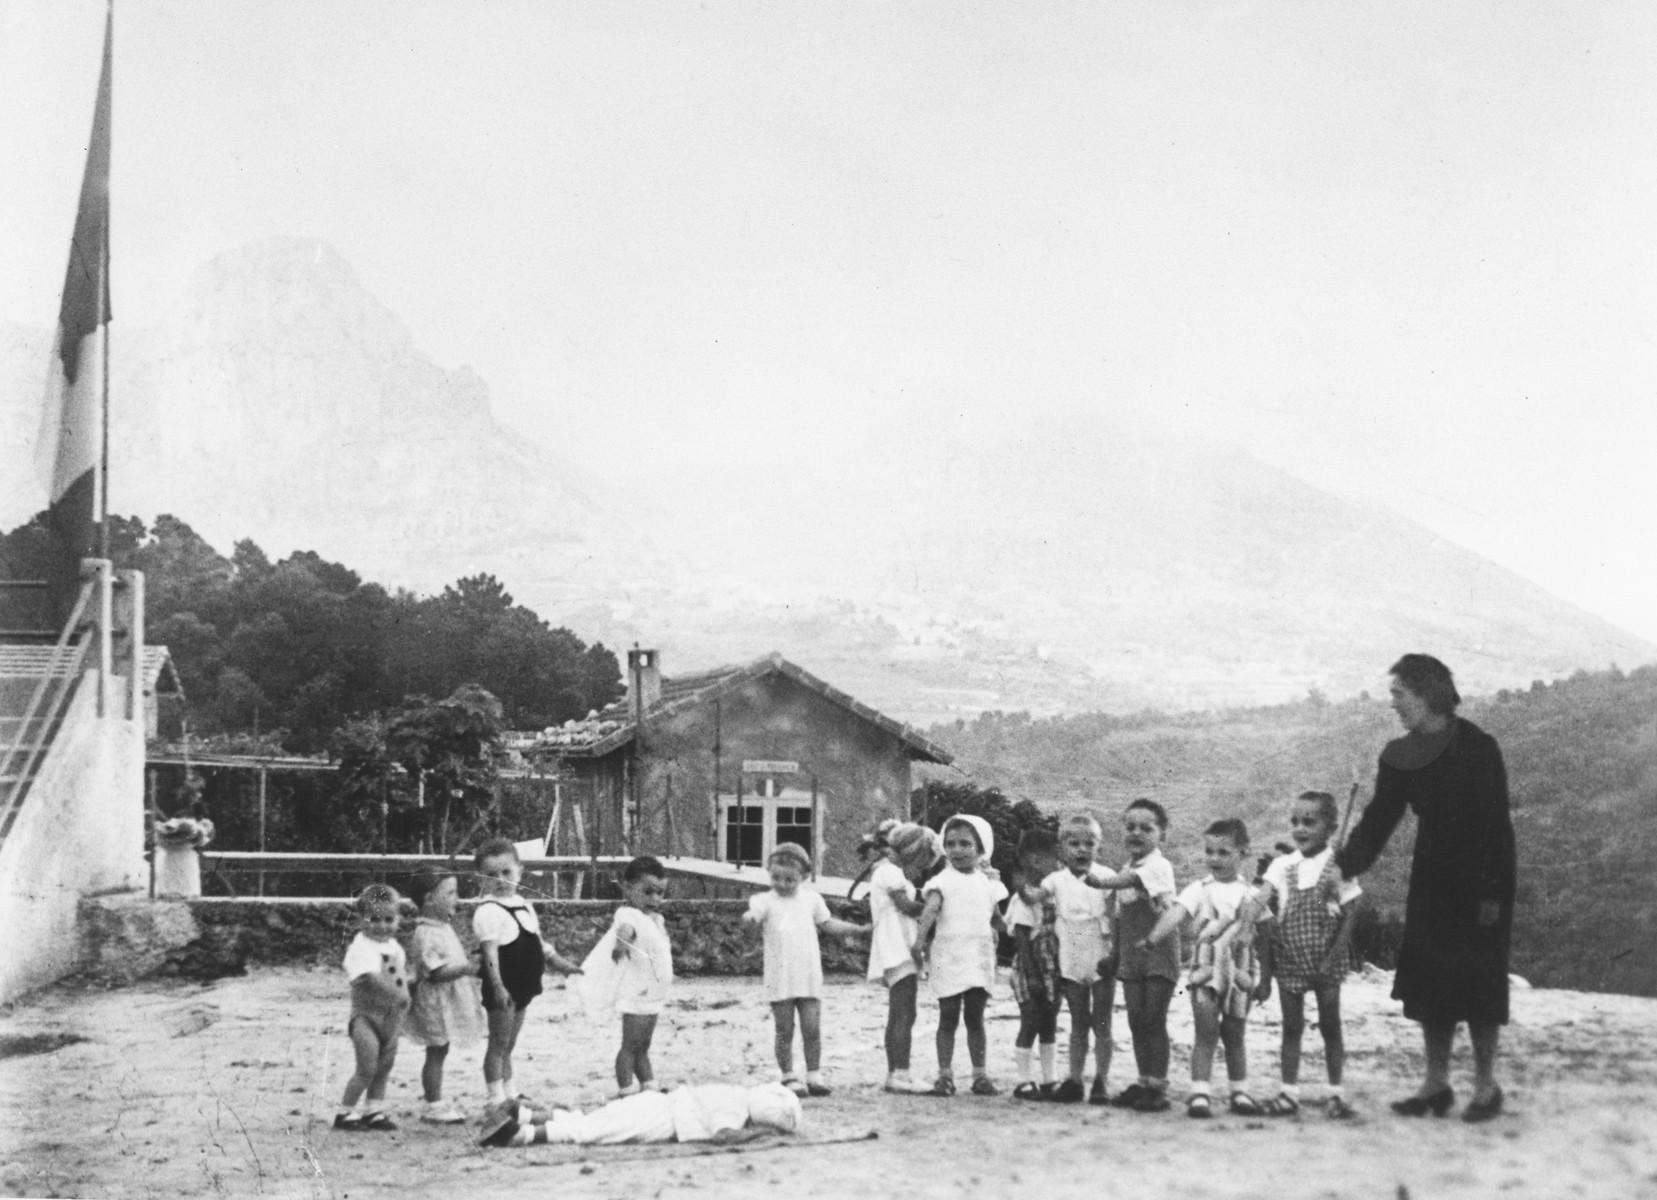 Miss Hermanova, a Czech Jewish nursery teacher, leads a circle game in the MACE children's home in Vence.